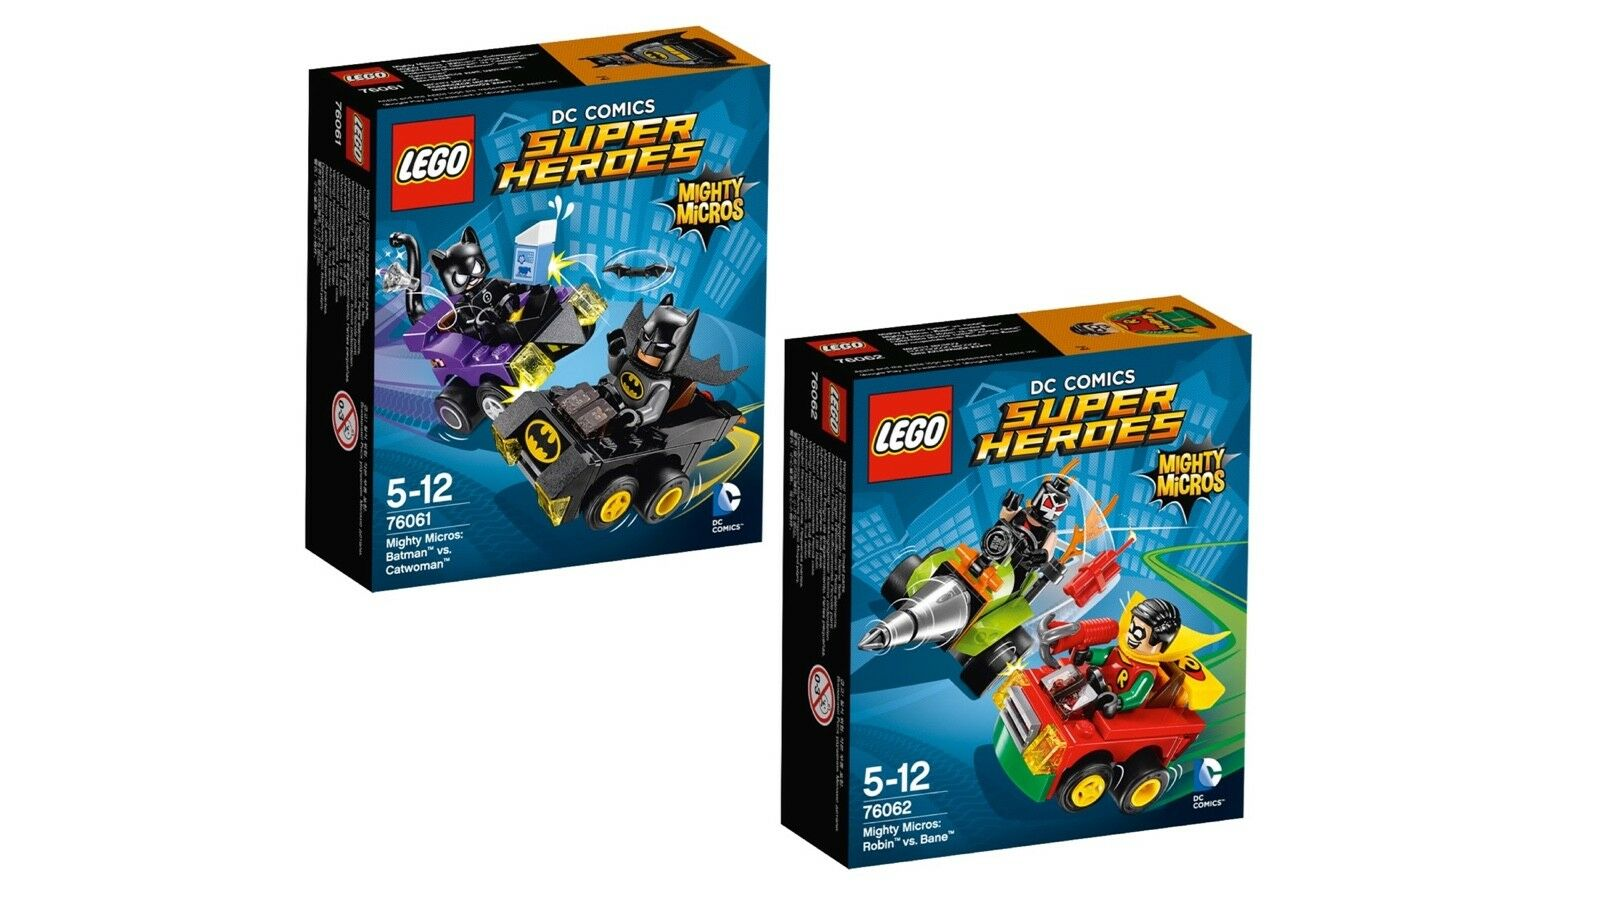 LEGO® DC Comics™ Super Heroes Mighty Micros Set 76061+76062 NEU OVP NEW MISB